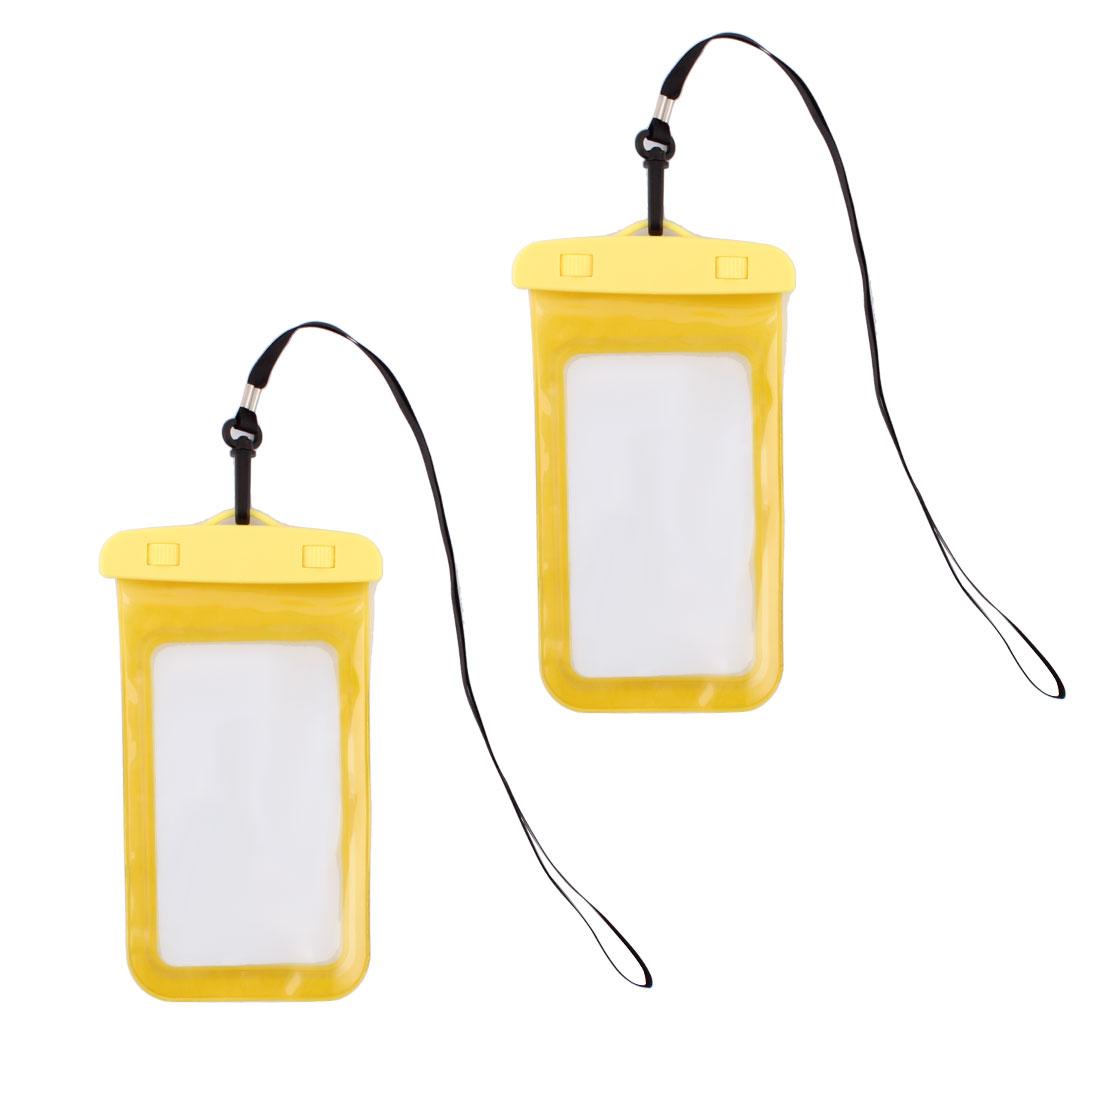 Phone Digital Camera PVC Water Resistant Snow Proof Bag Yellow 2 Pcs